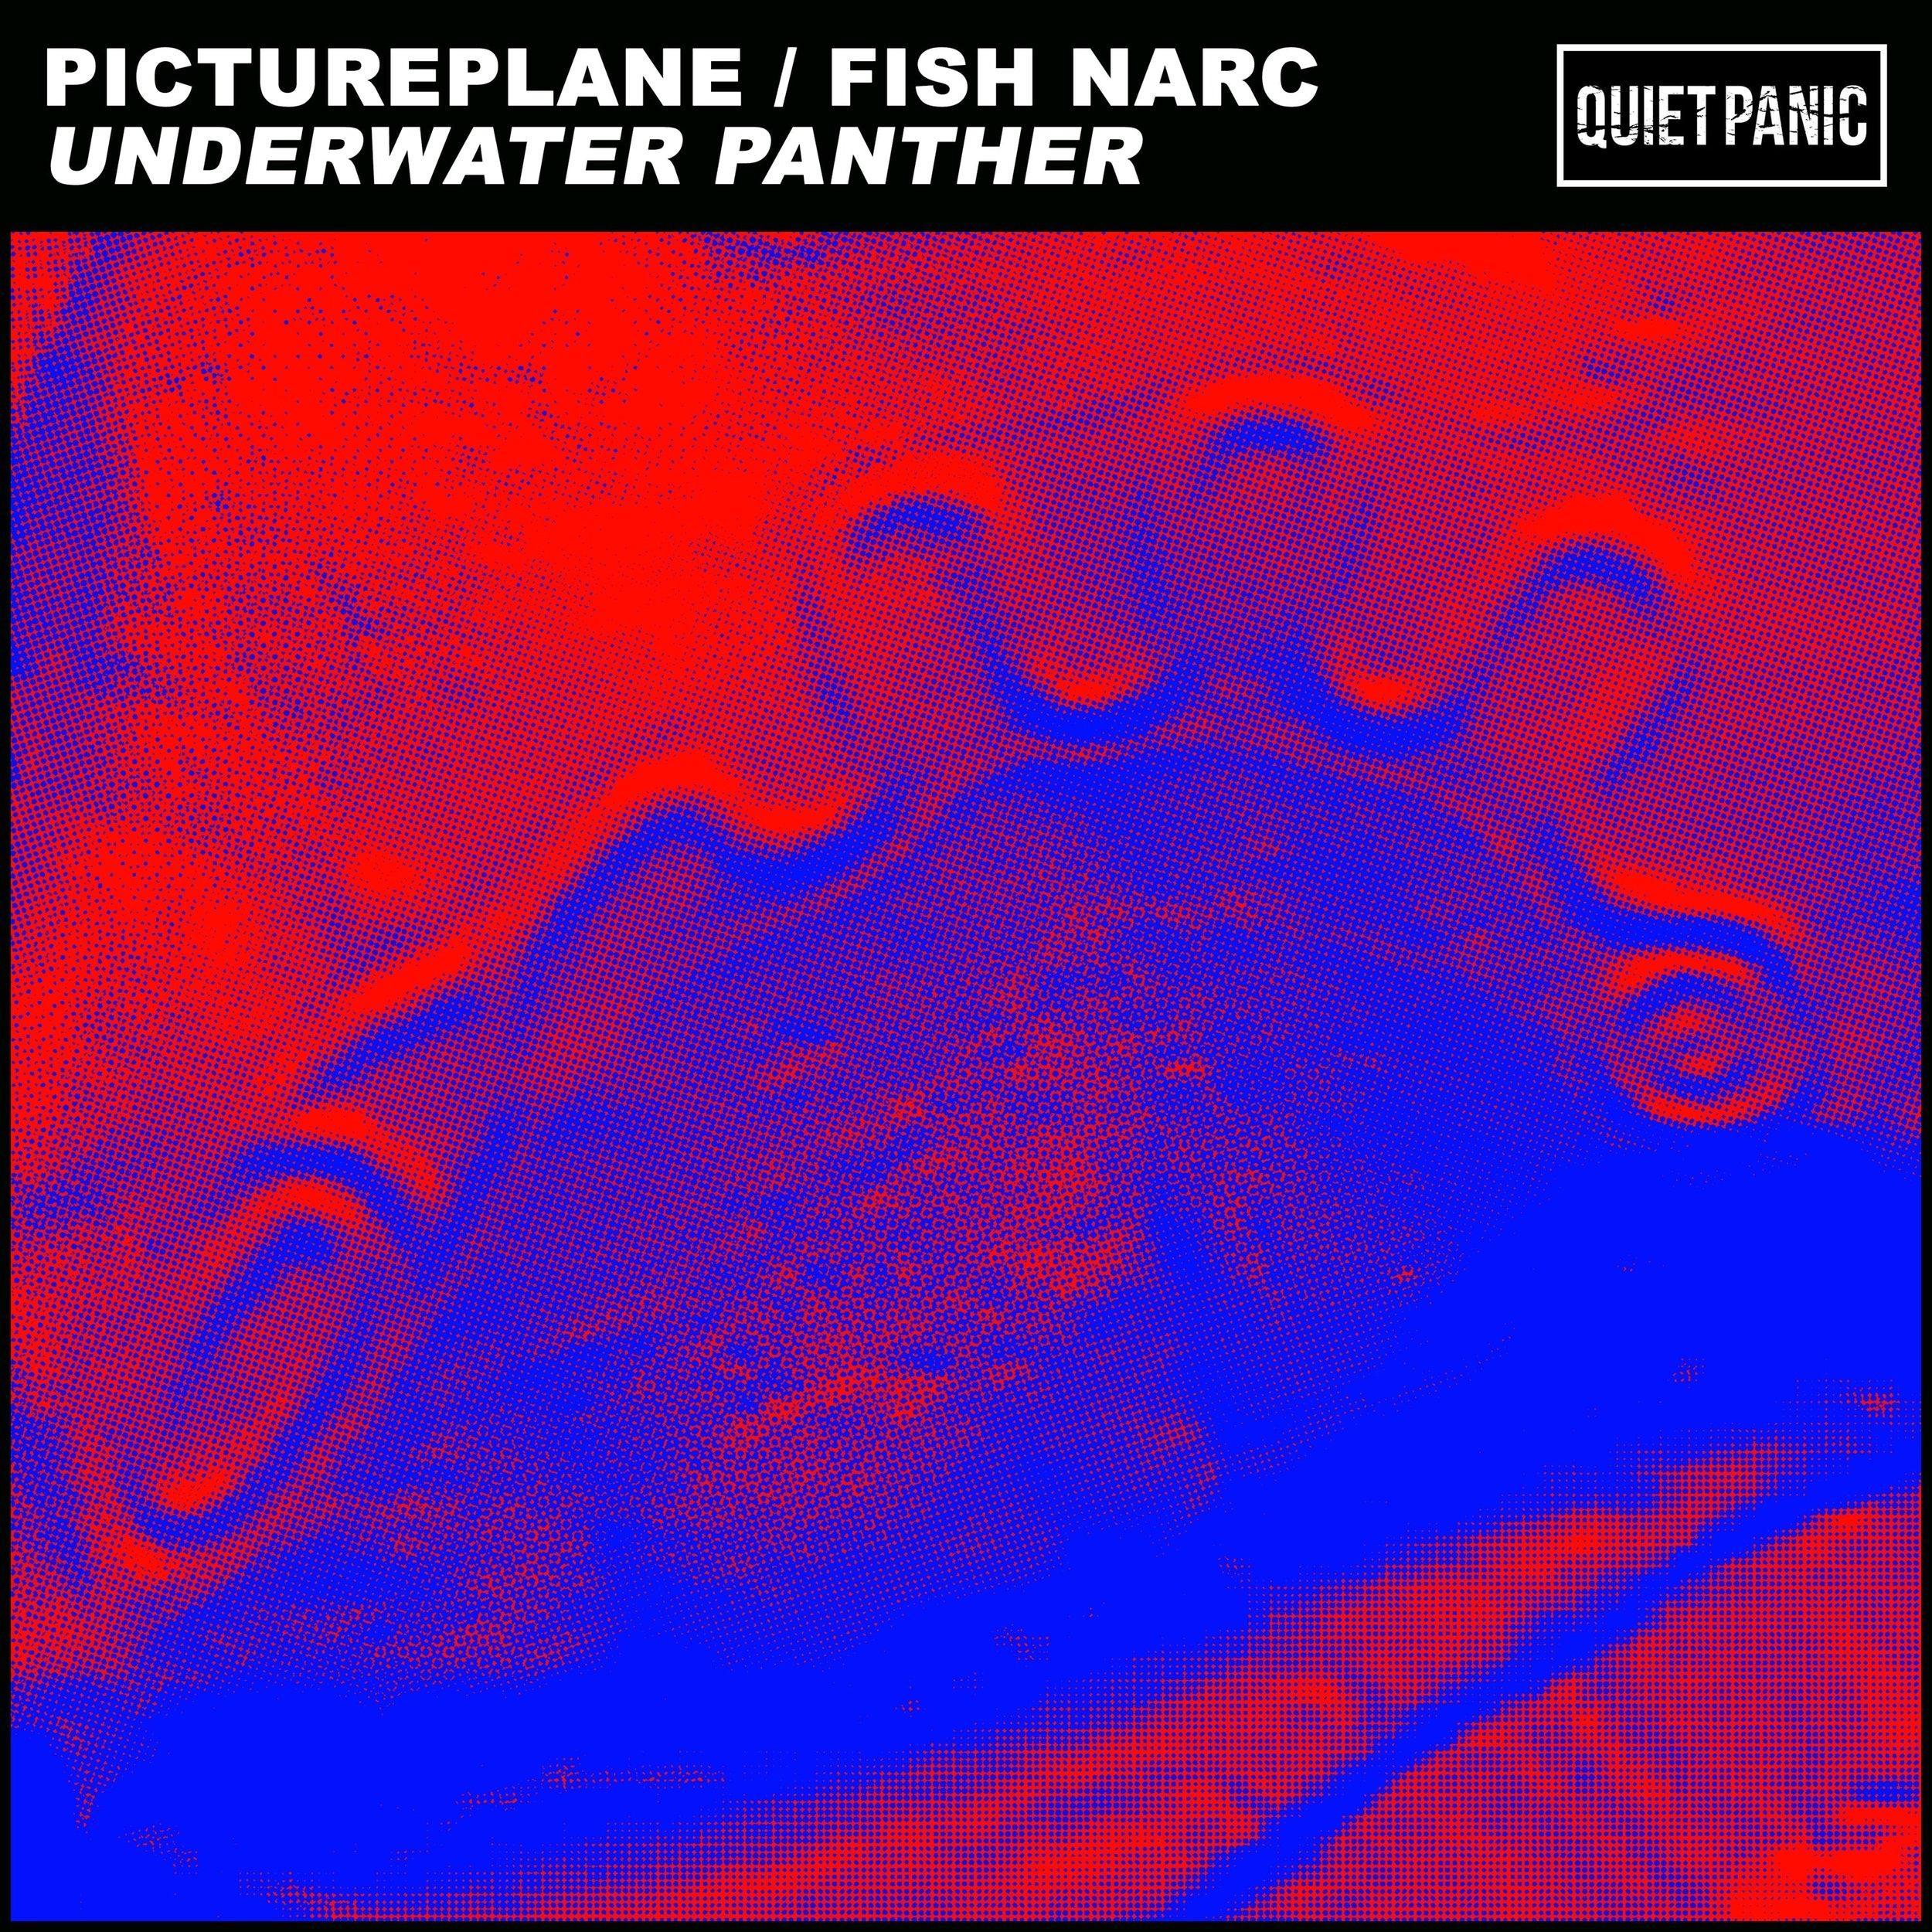 PICTUREPLANExFISHNARC_UnderwaterPanther_single_3000x3000_RGB.jpg